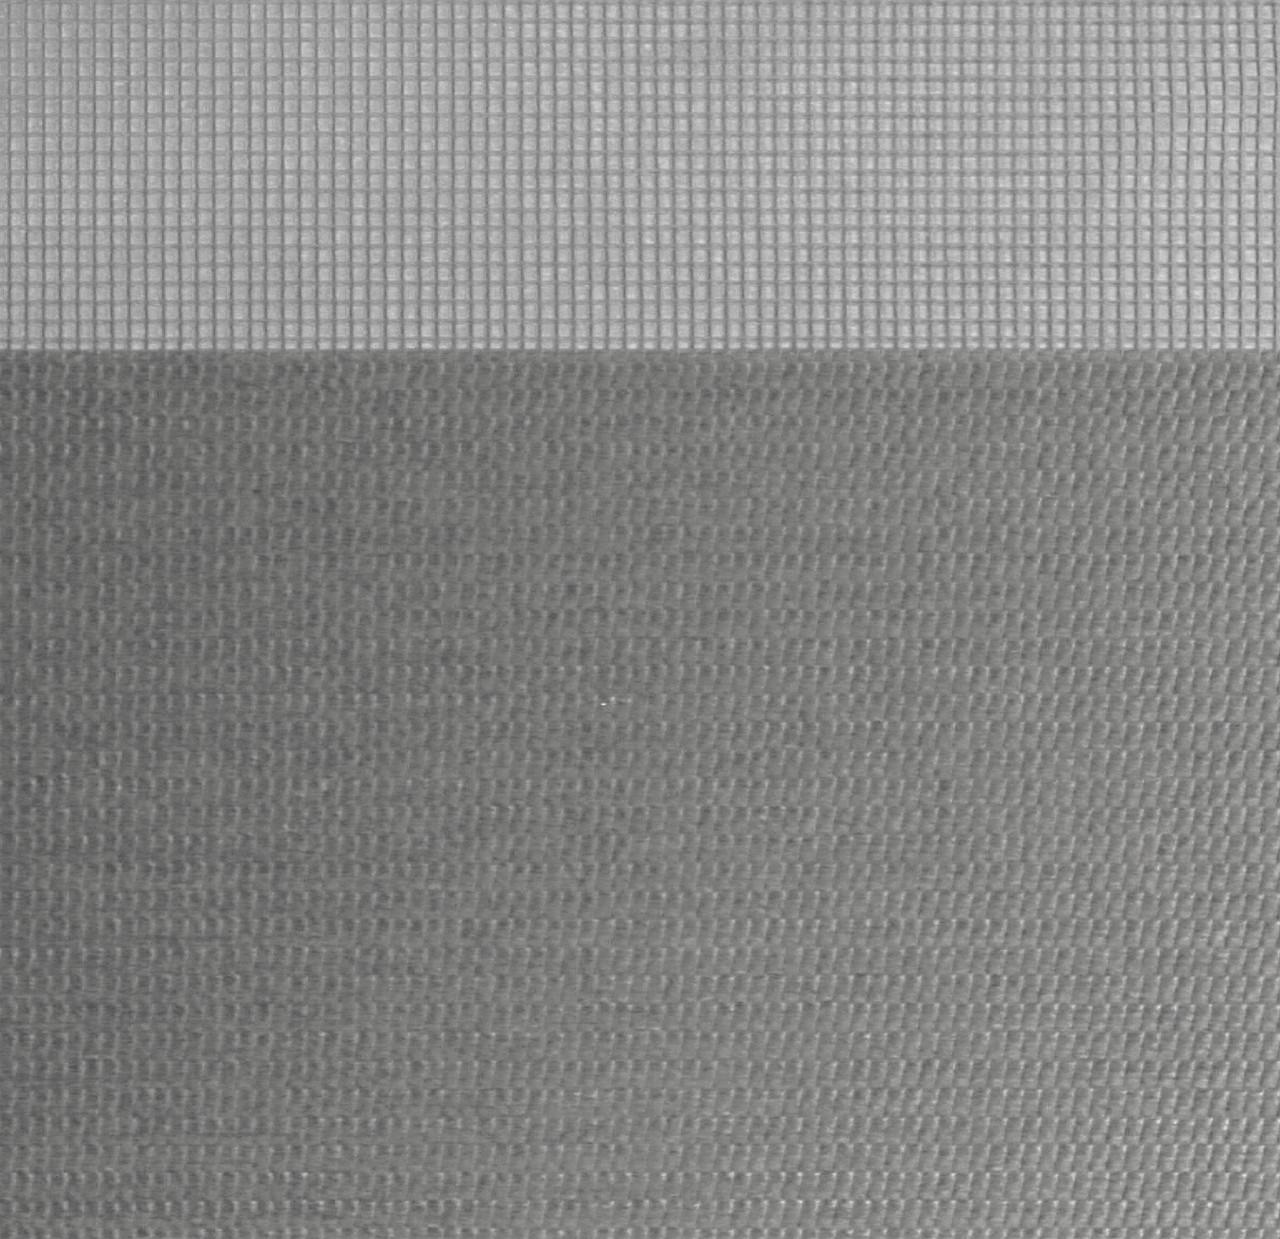 Рулонные шторы День-Ночь Ткань Рио Z-079 Серый